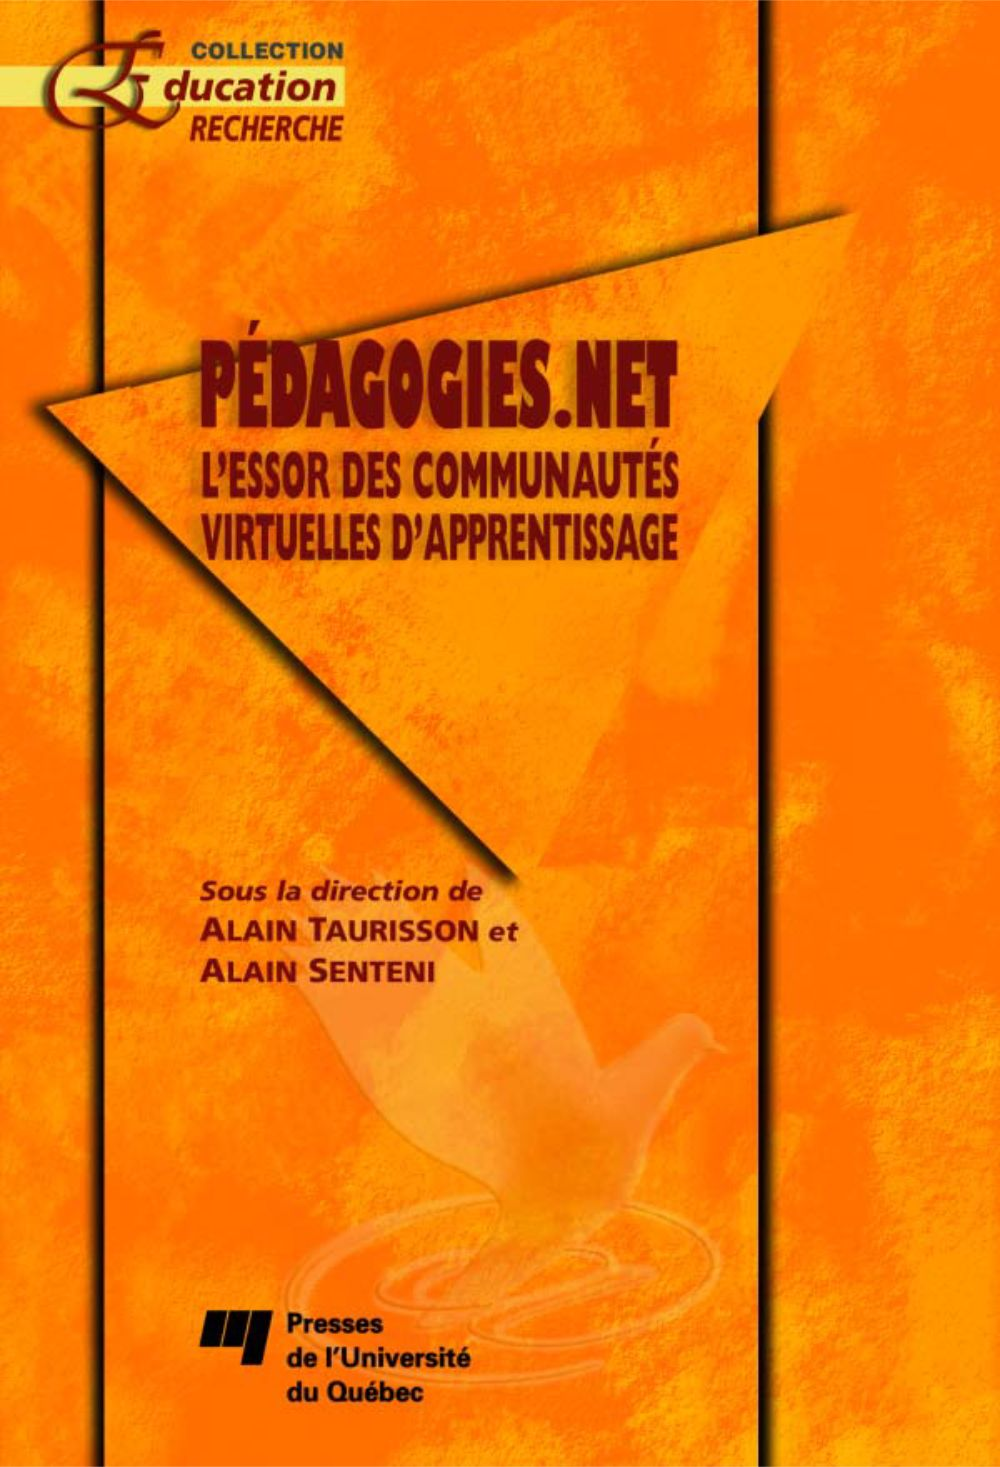 Pédagogies.net